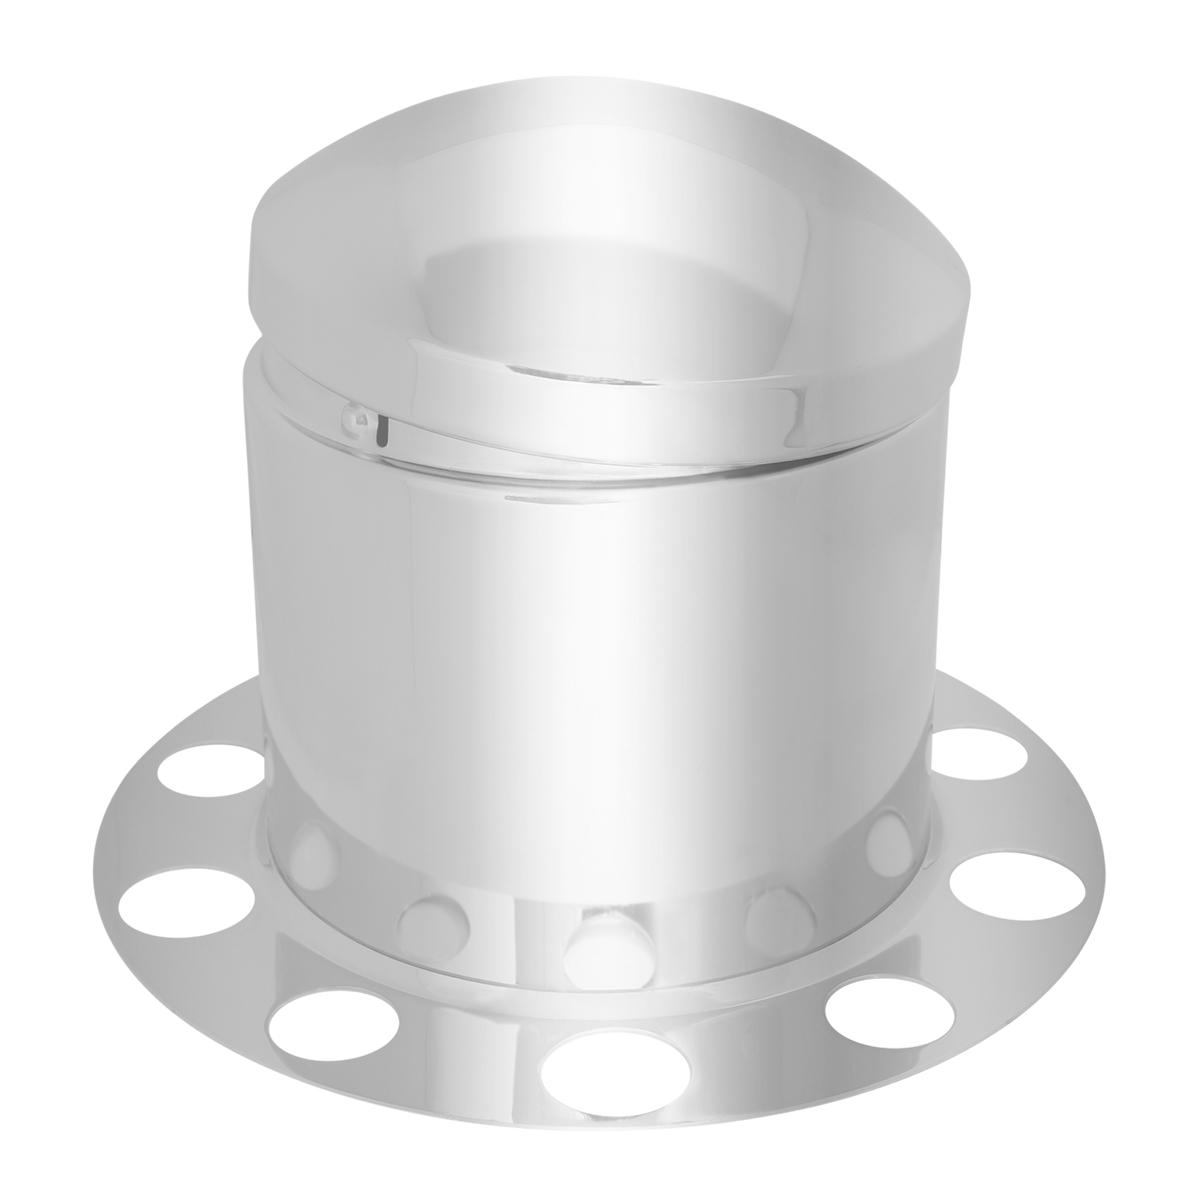 3 Piece Rear Axle Cover Set w/ Standard Hub Cap